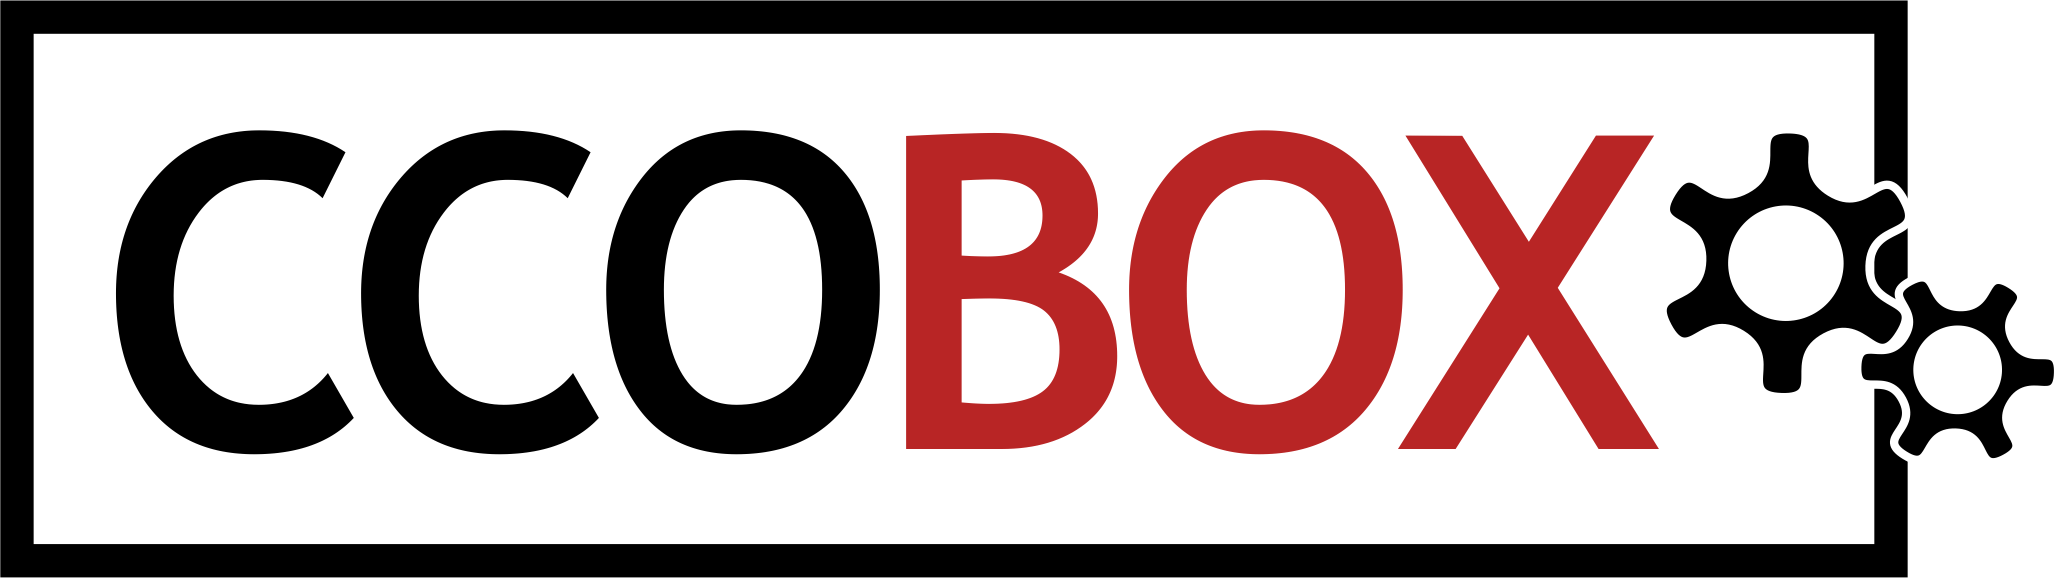 CCOBOX